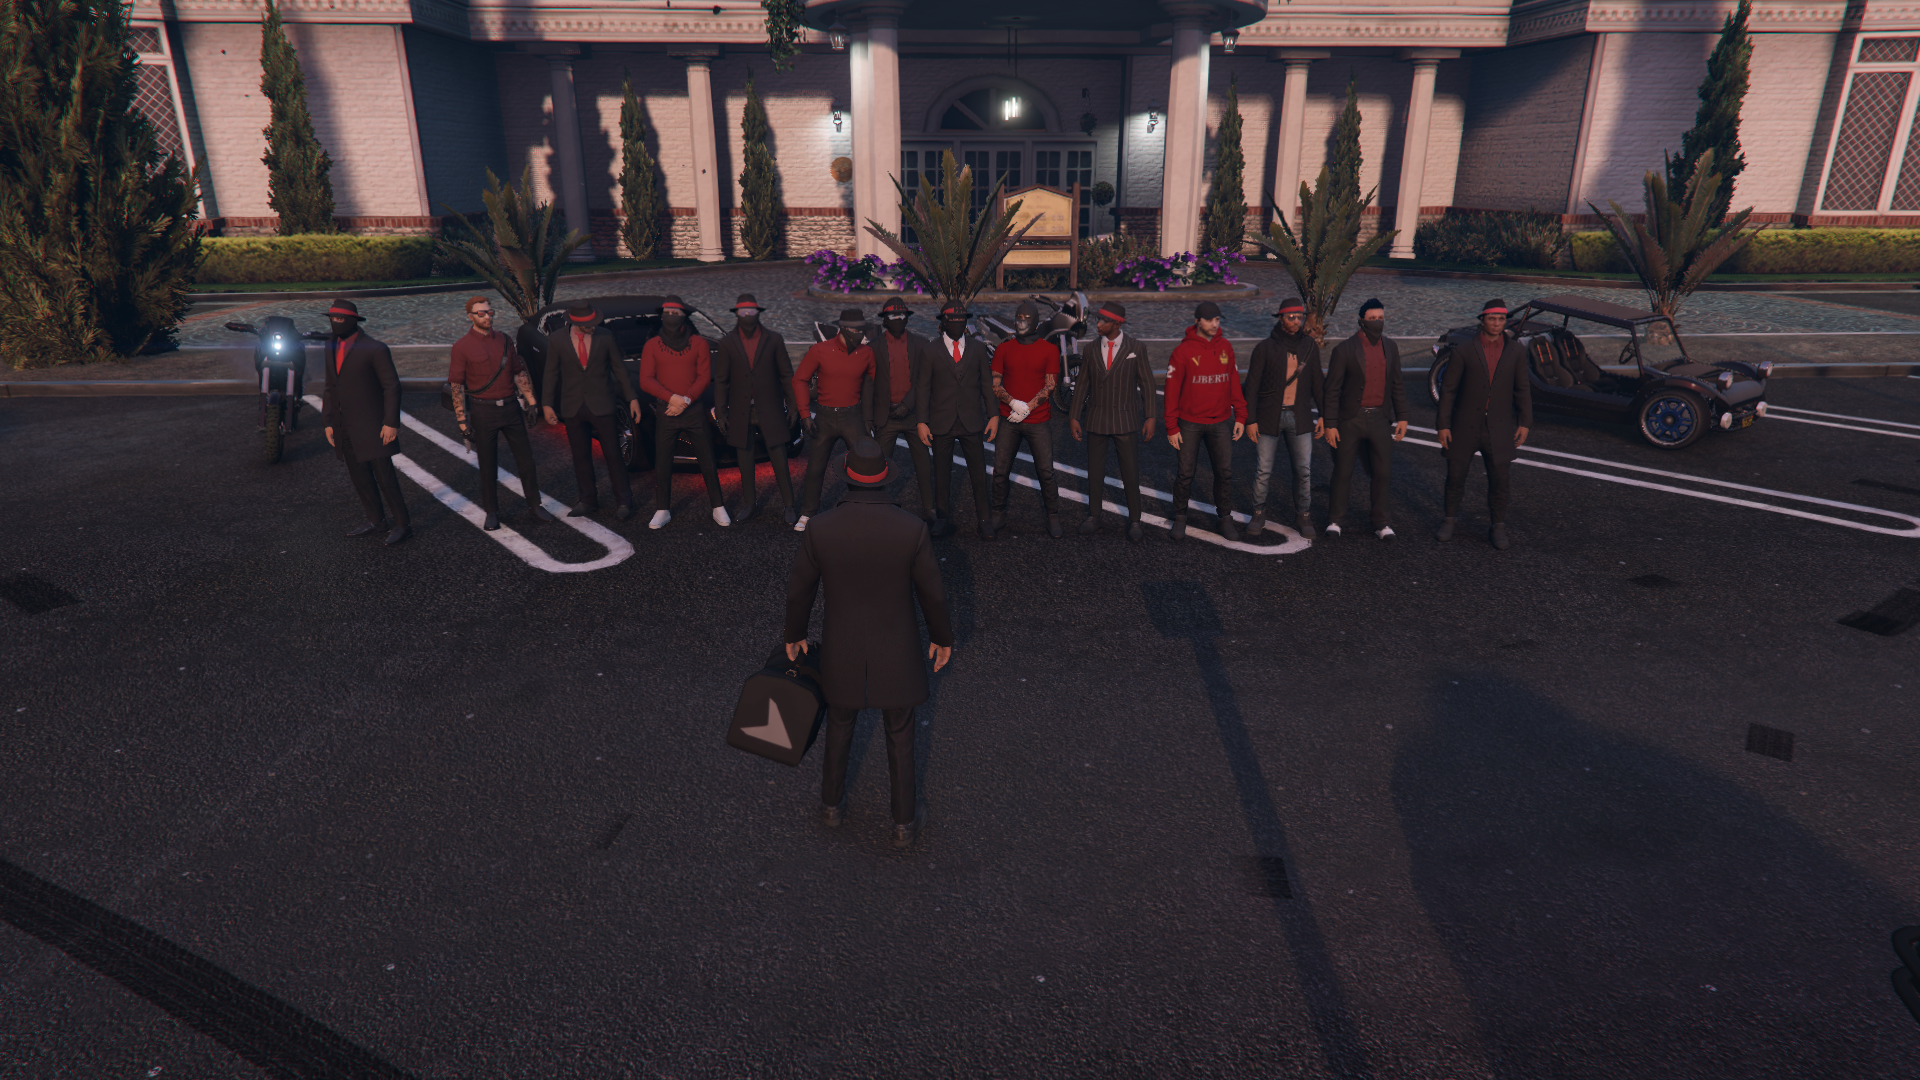 Grand_Theft_Auto_V_Screenshot_2021.03.22_-_22.33.33.50.png